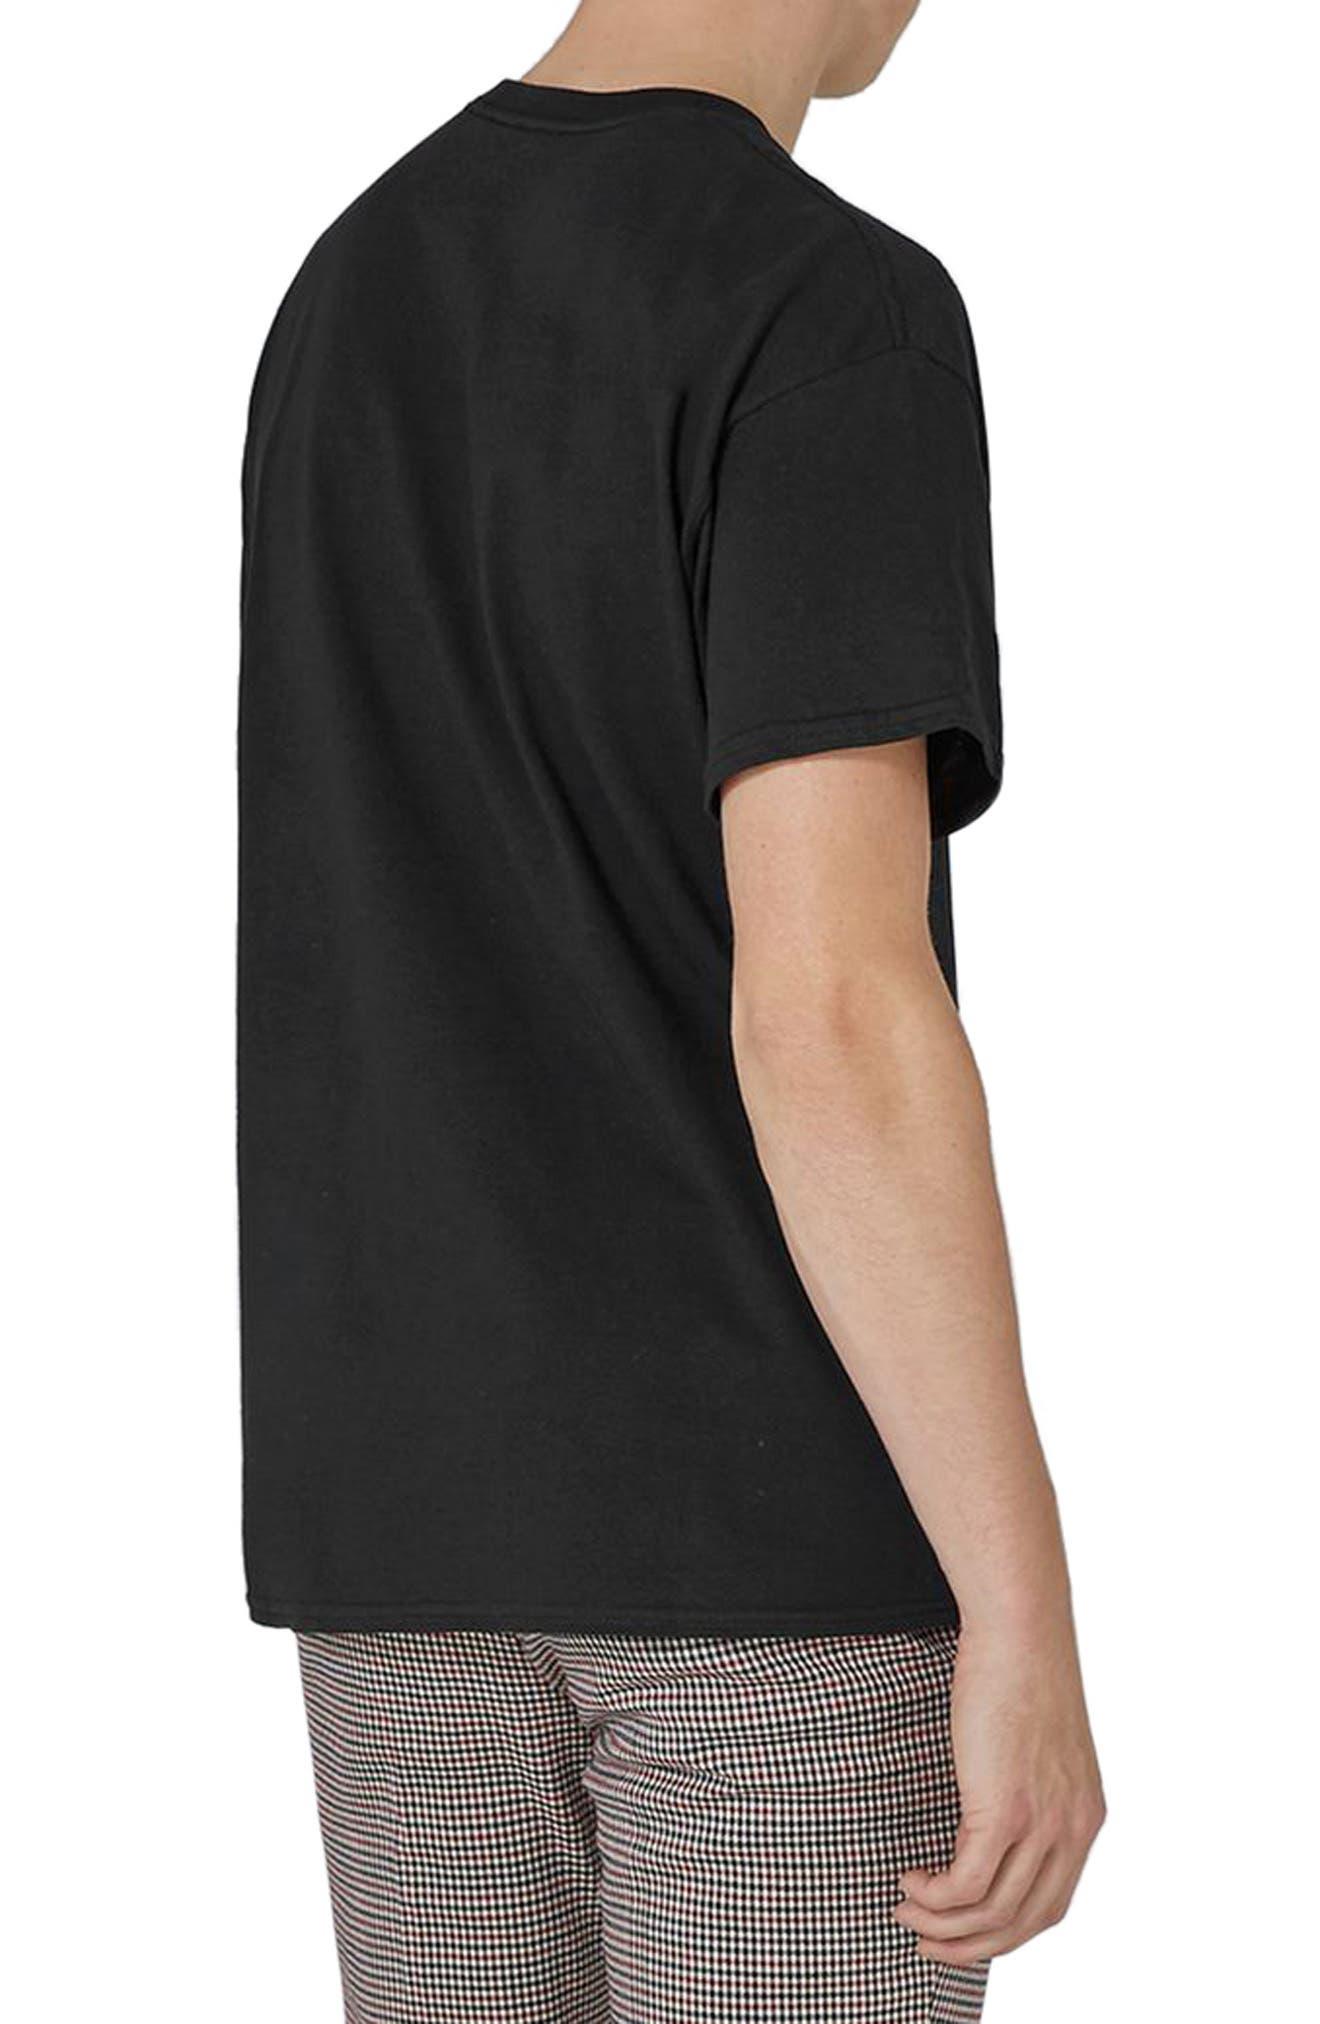 Whitney Houston Graphic T-Shirt,                             Alternate thumbnail 2, color,                             Black Multi